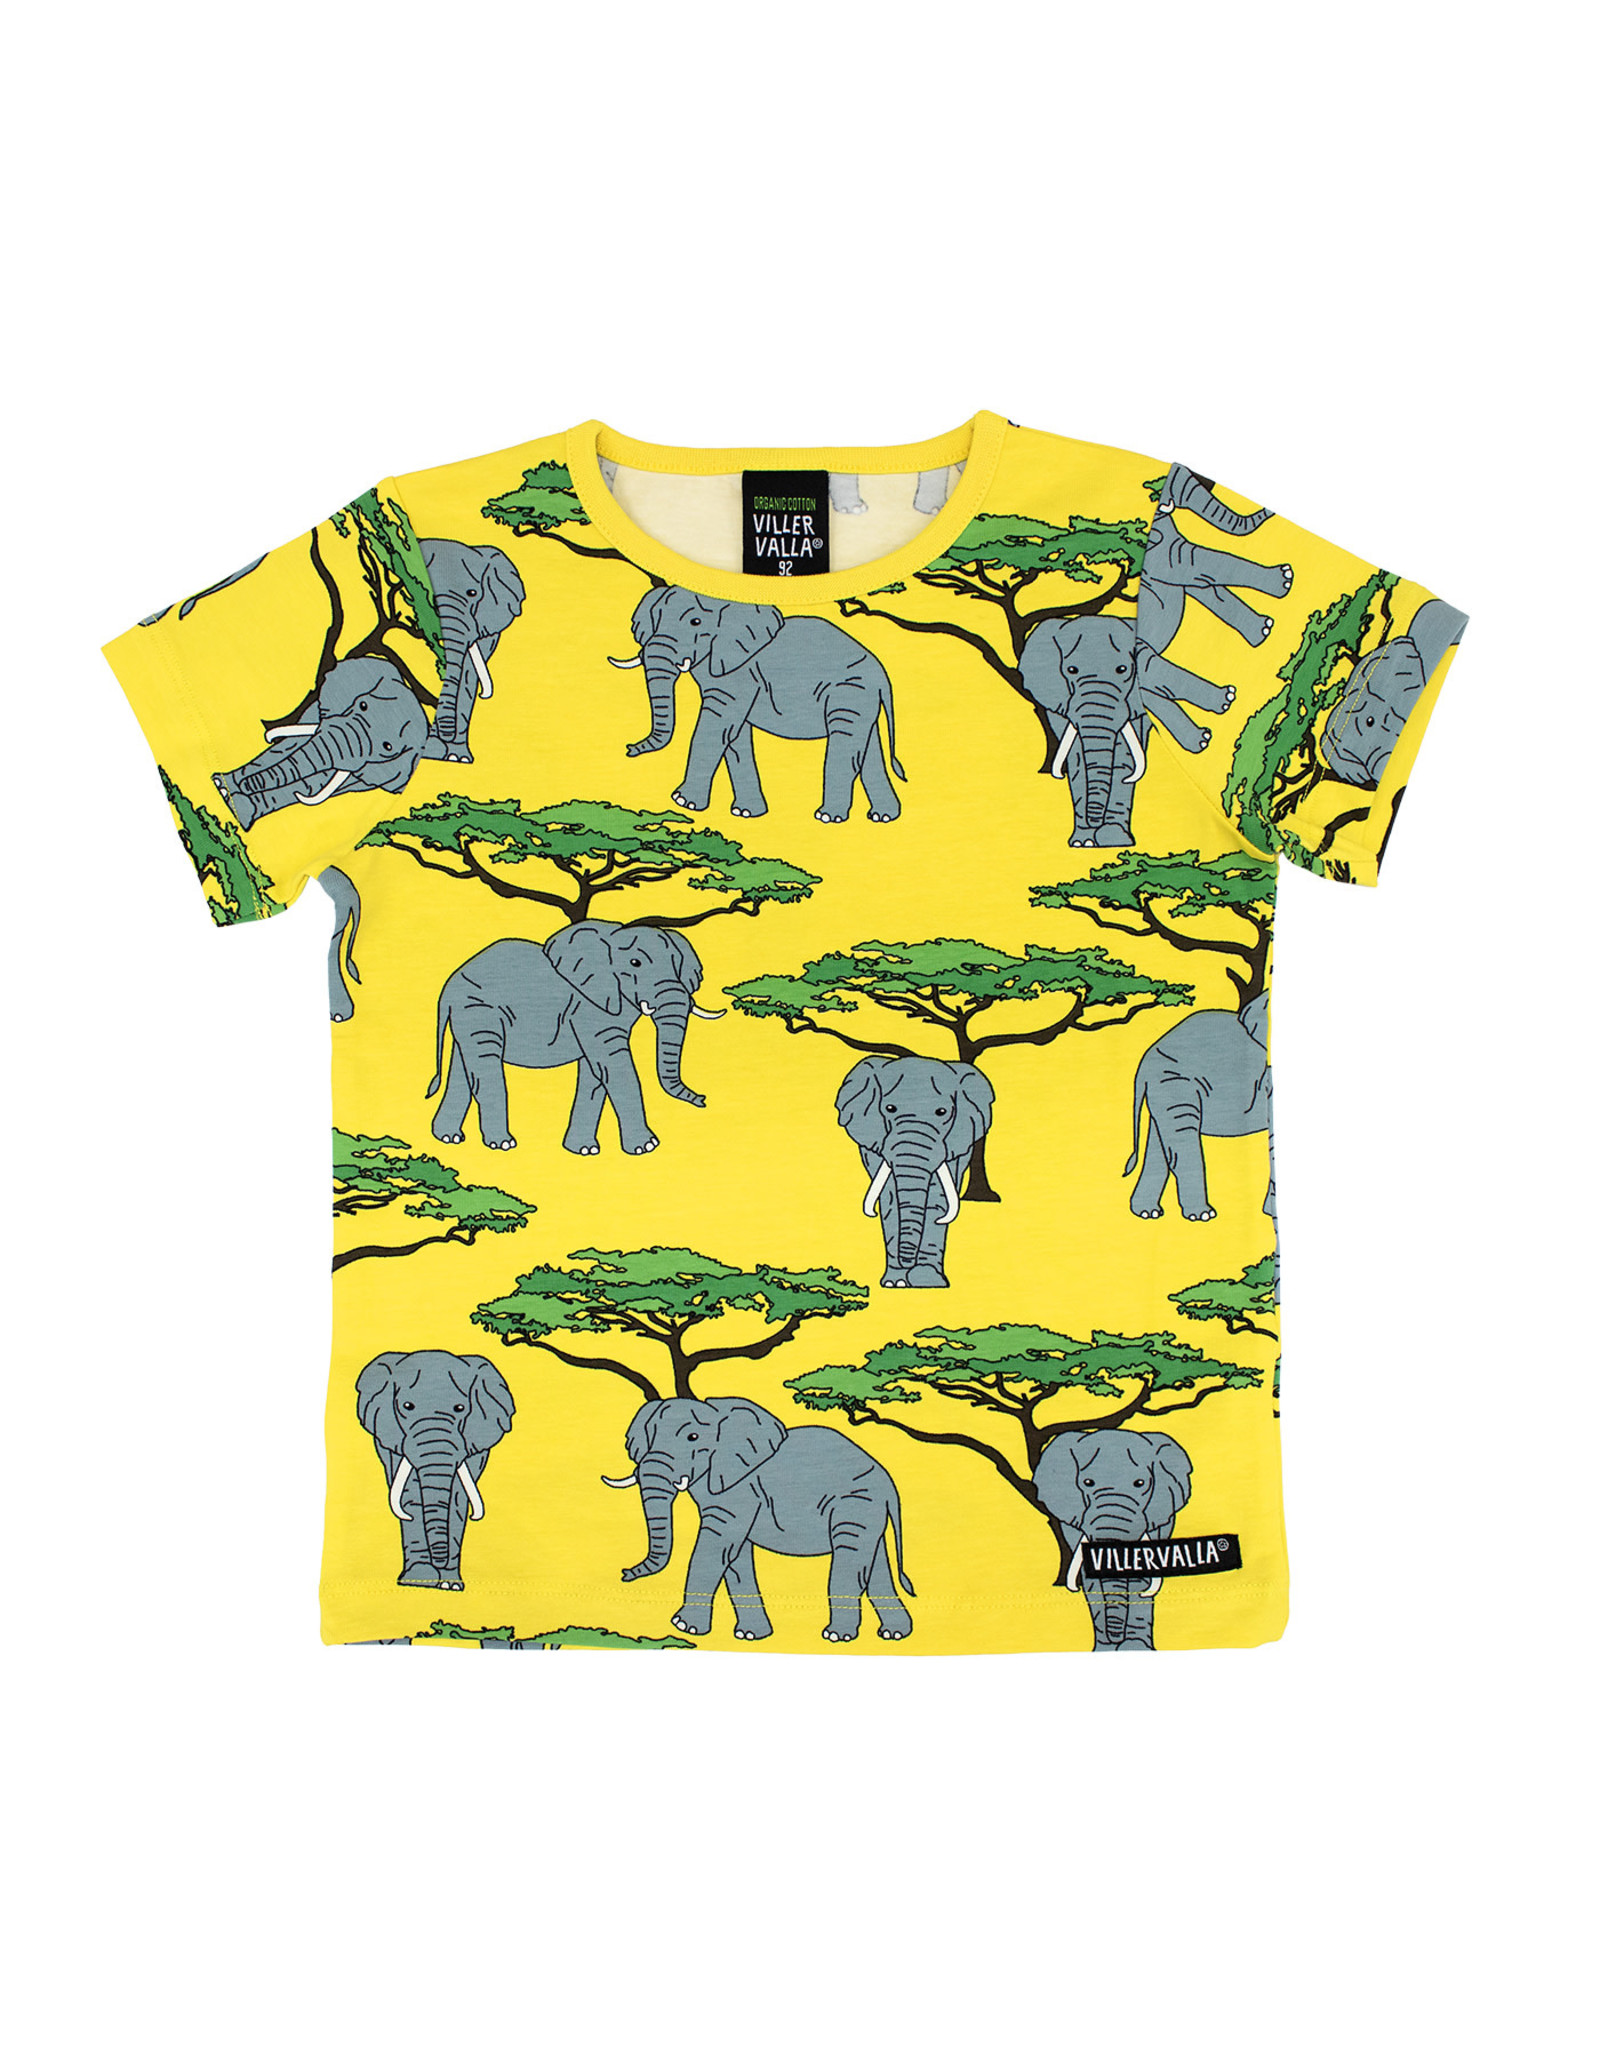 Villervalla Gele t-shirt met olifanten